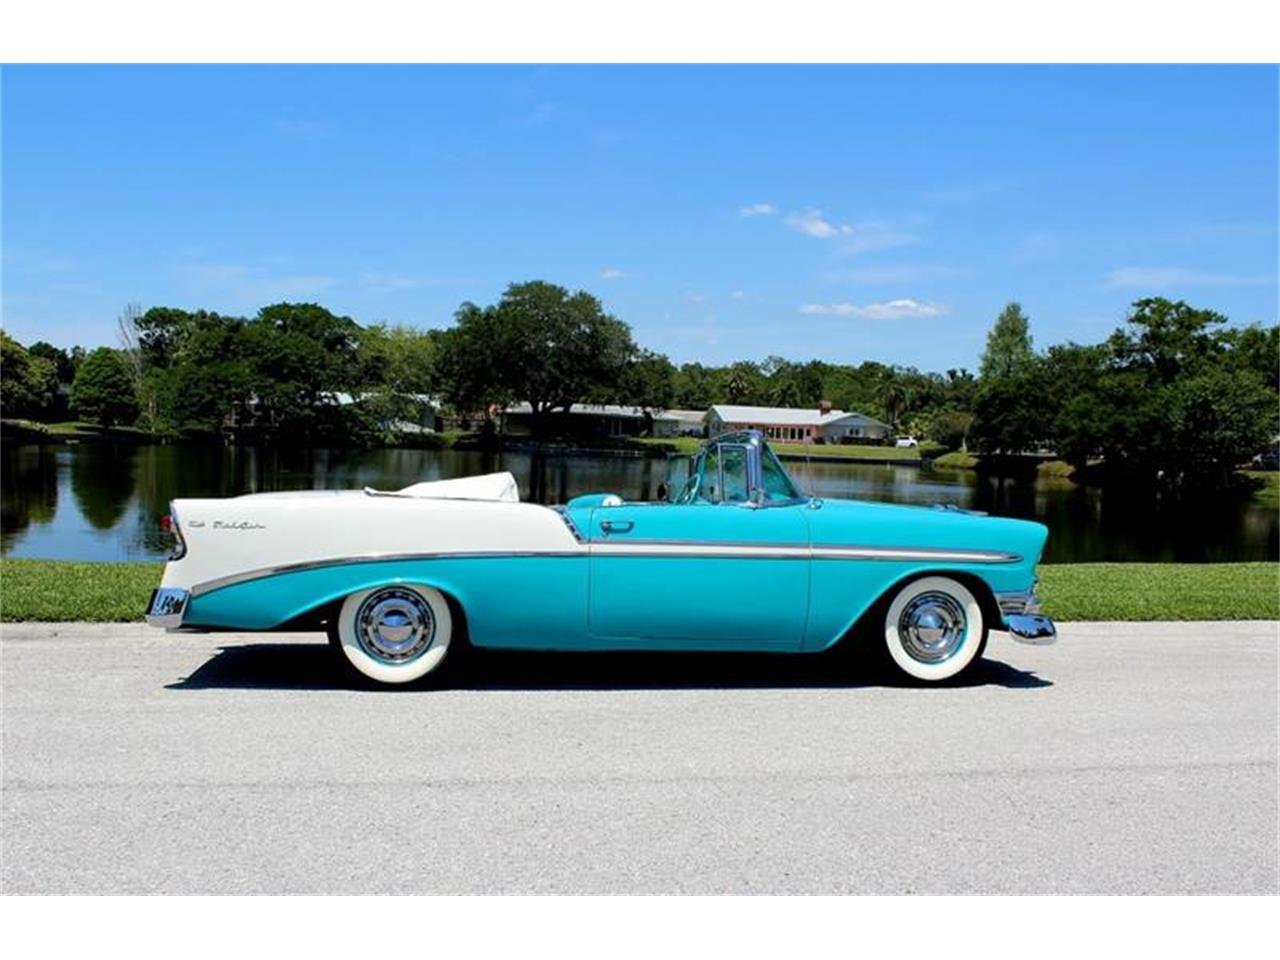 Astounding For Sale 1956 Chevrolet Bel Air In Clearwater Florida Beutiful Home Inspiration Semekurdistantinfo